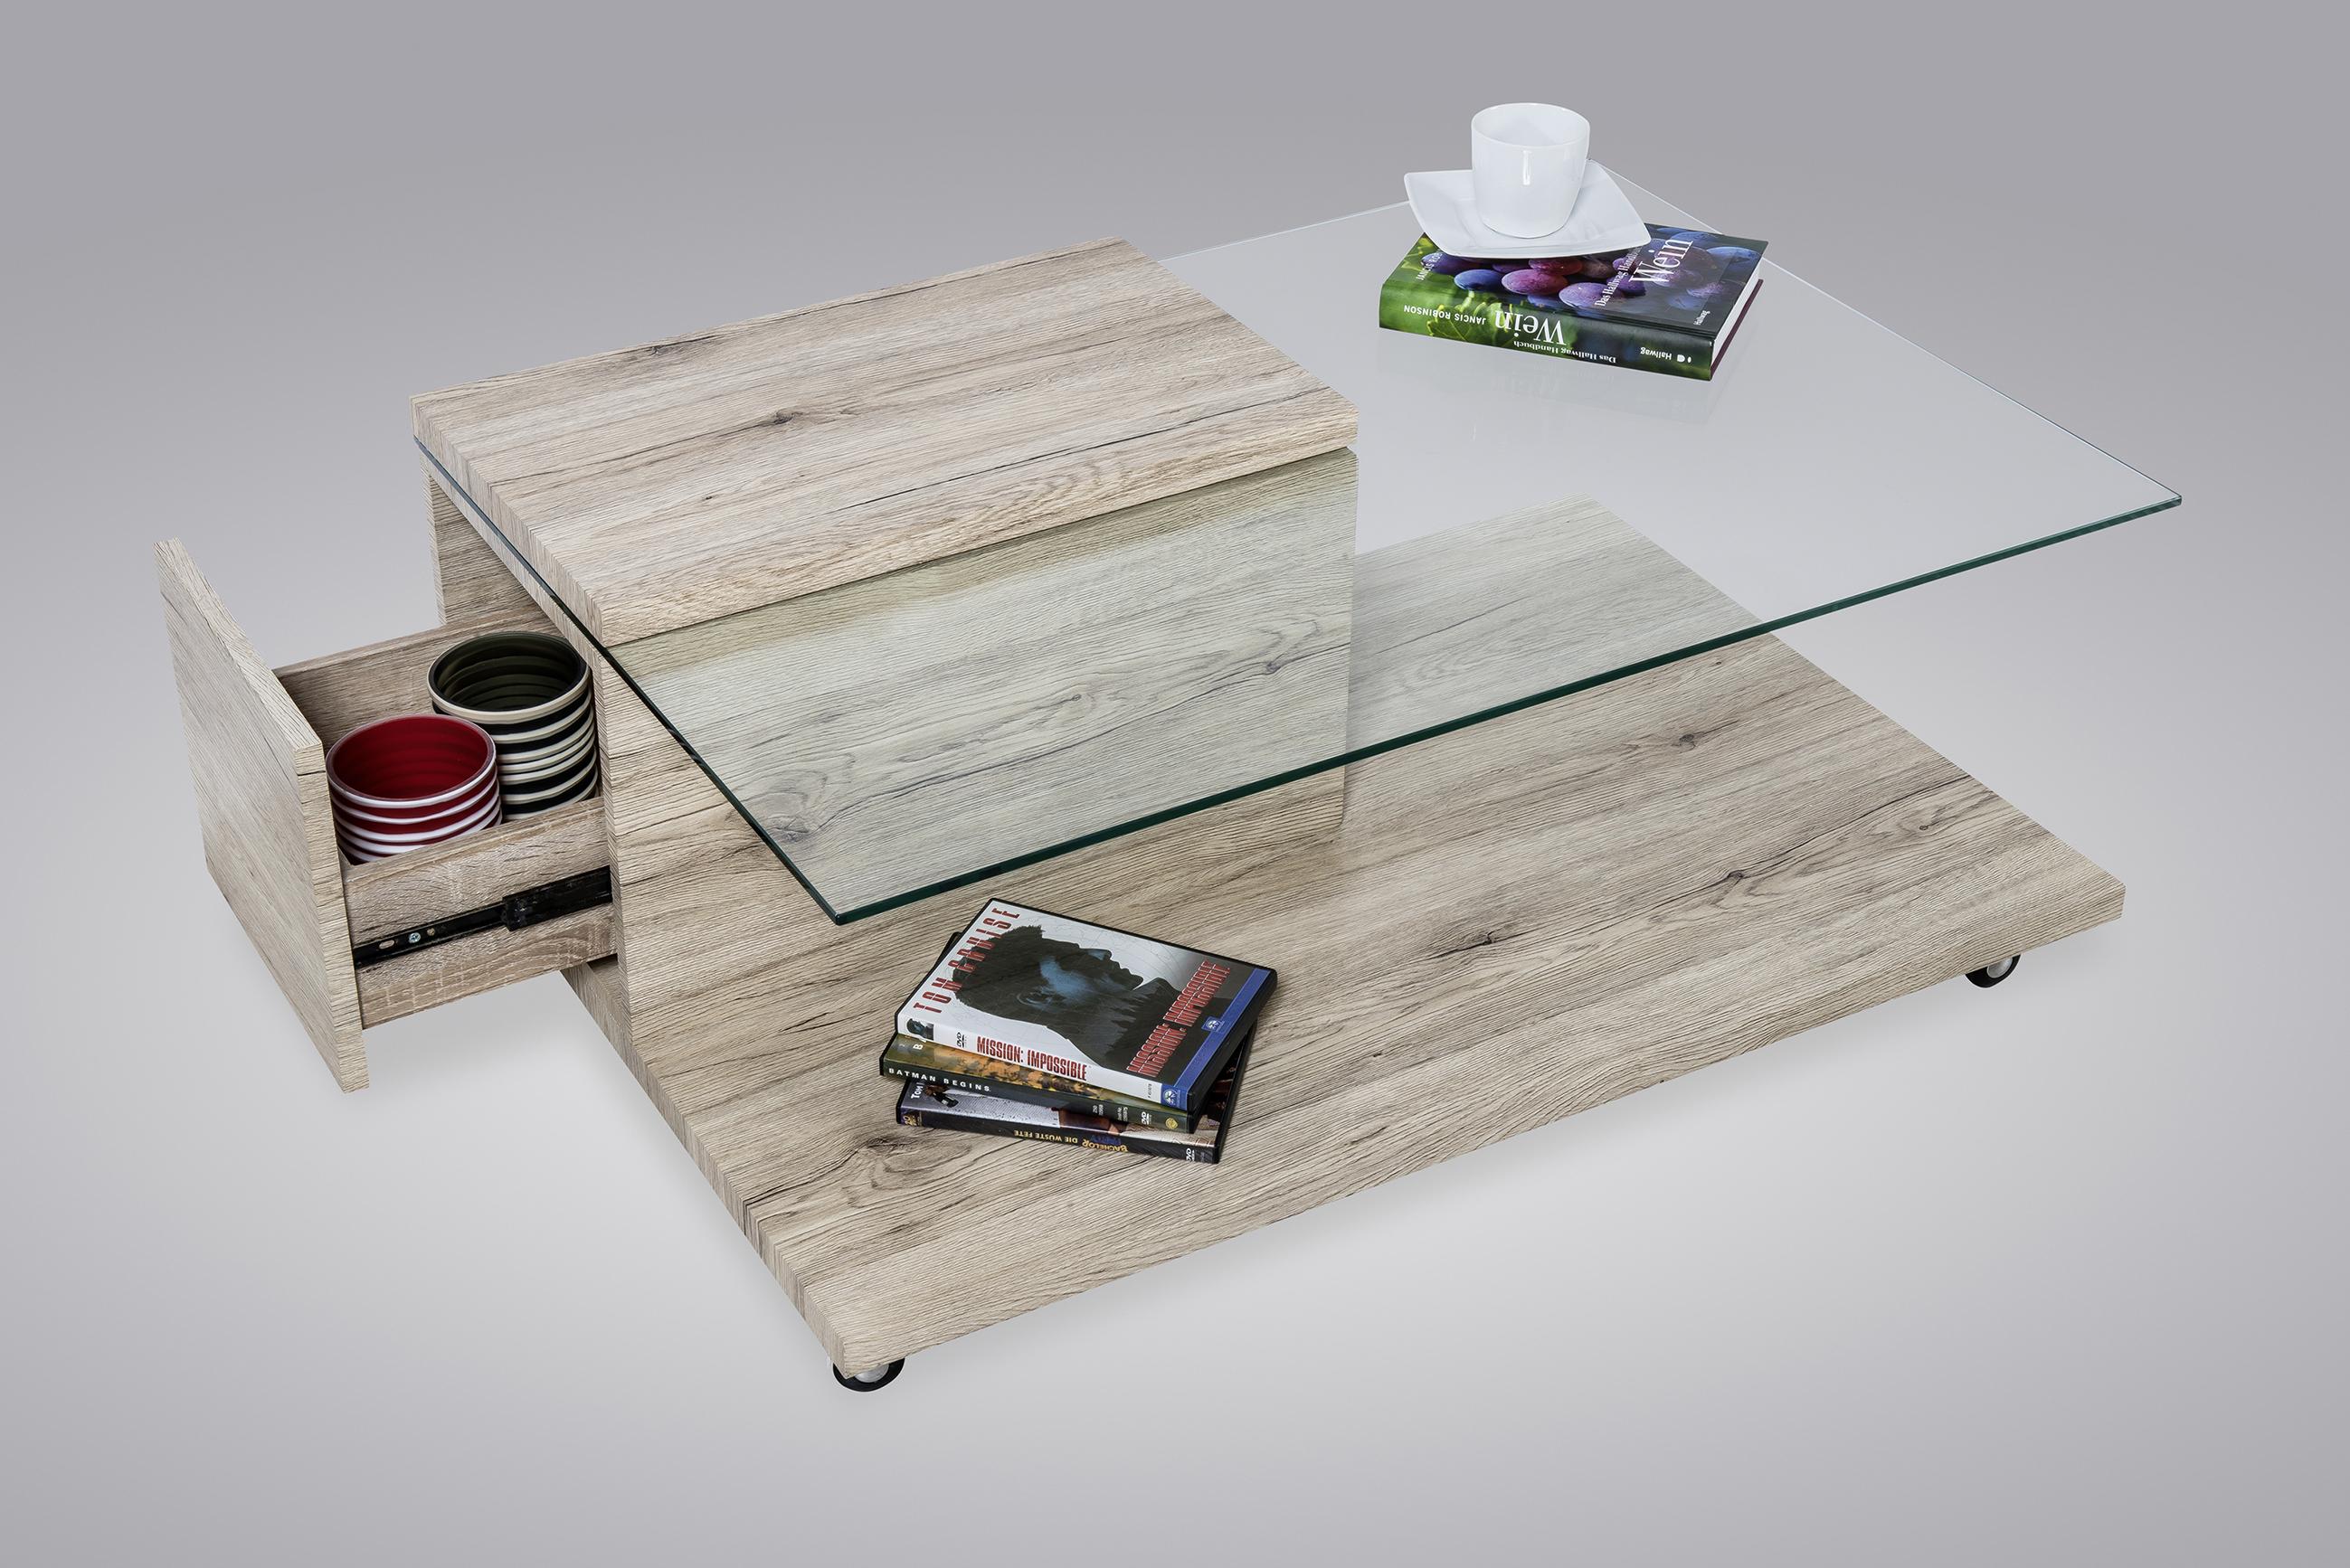 m bel haus 24 couchtisch henning san remo mdf glas. Black Bedroom Furniture Sets. Home Design Ideas